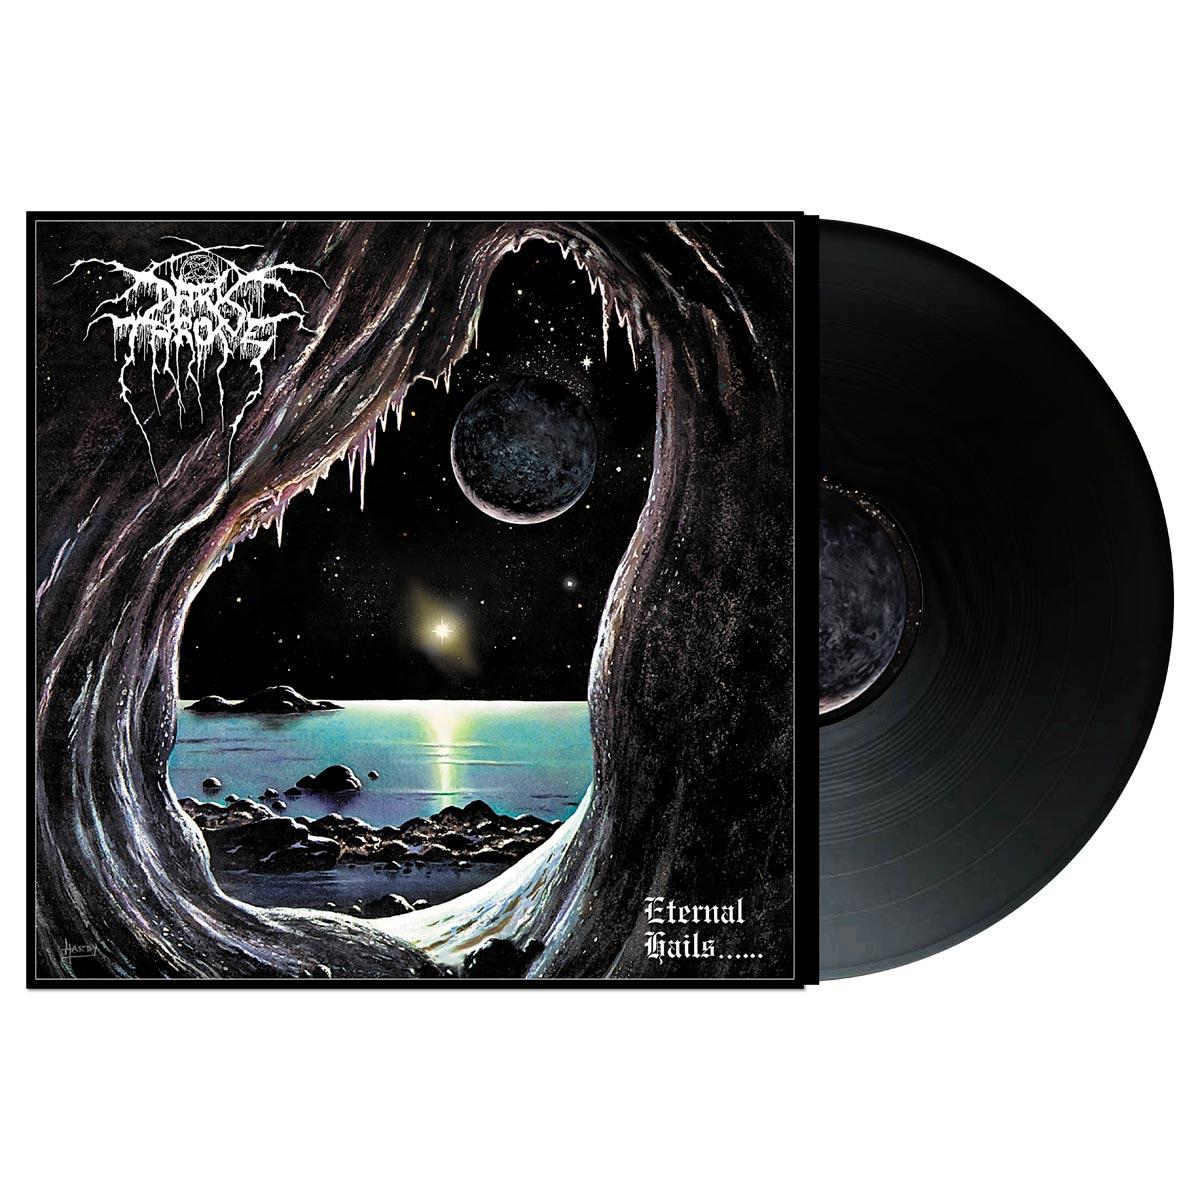 Eternal Hails - Darkthrone - Musik - PEACEVILLE - 0801056891013 - June 25, 2021